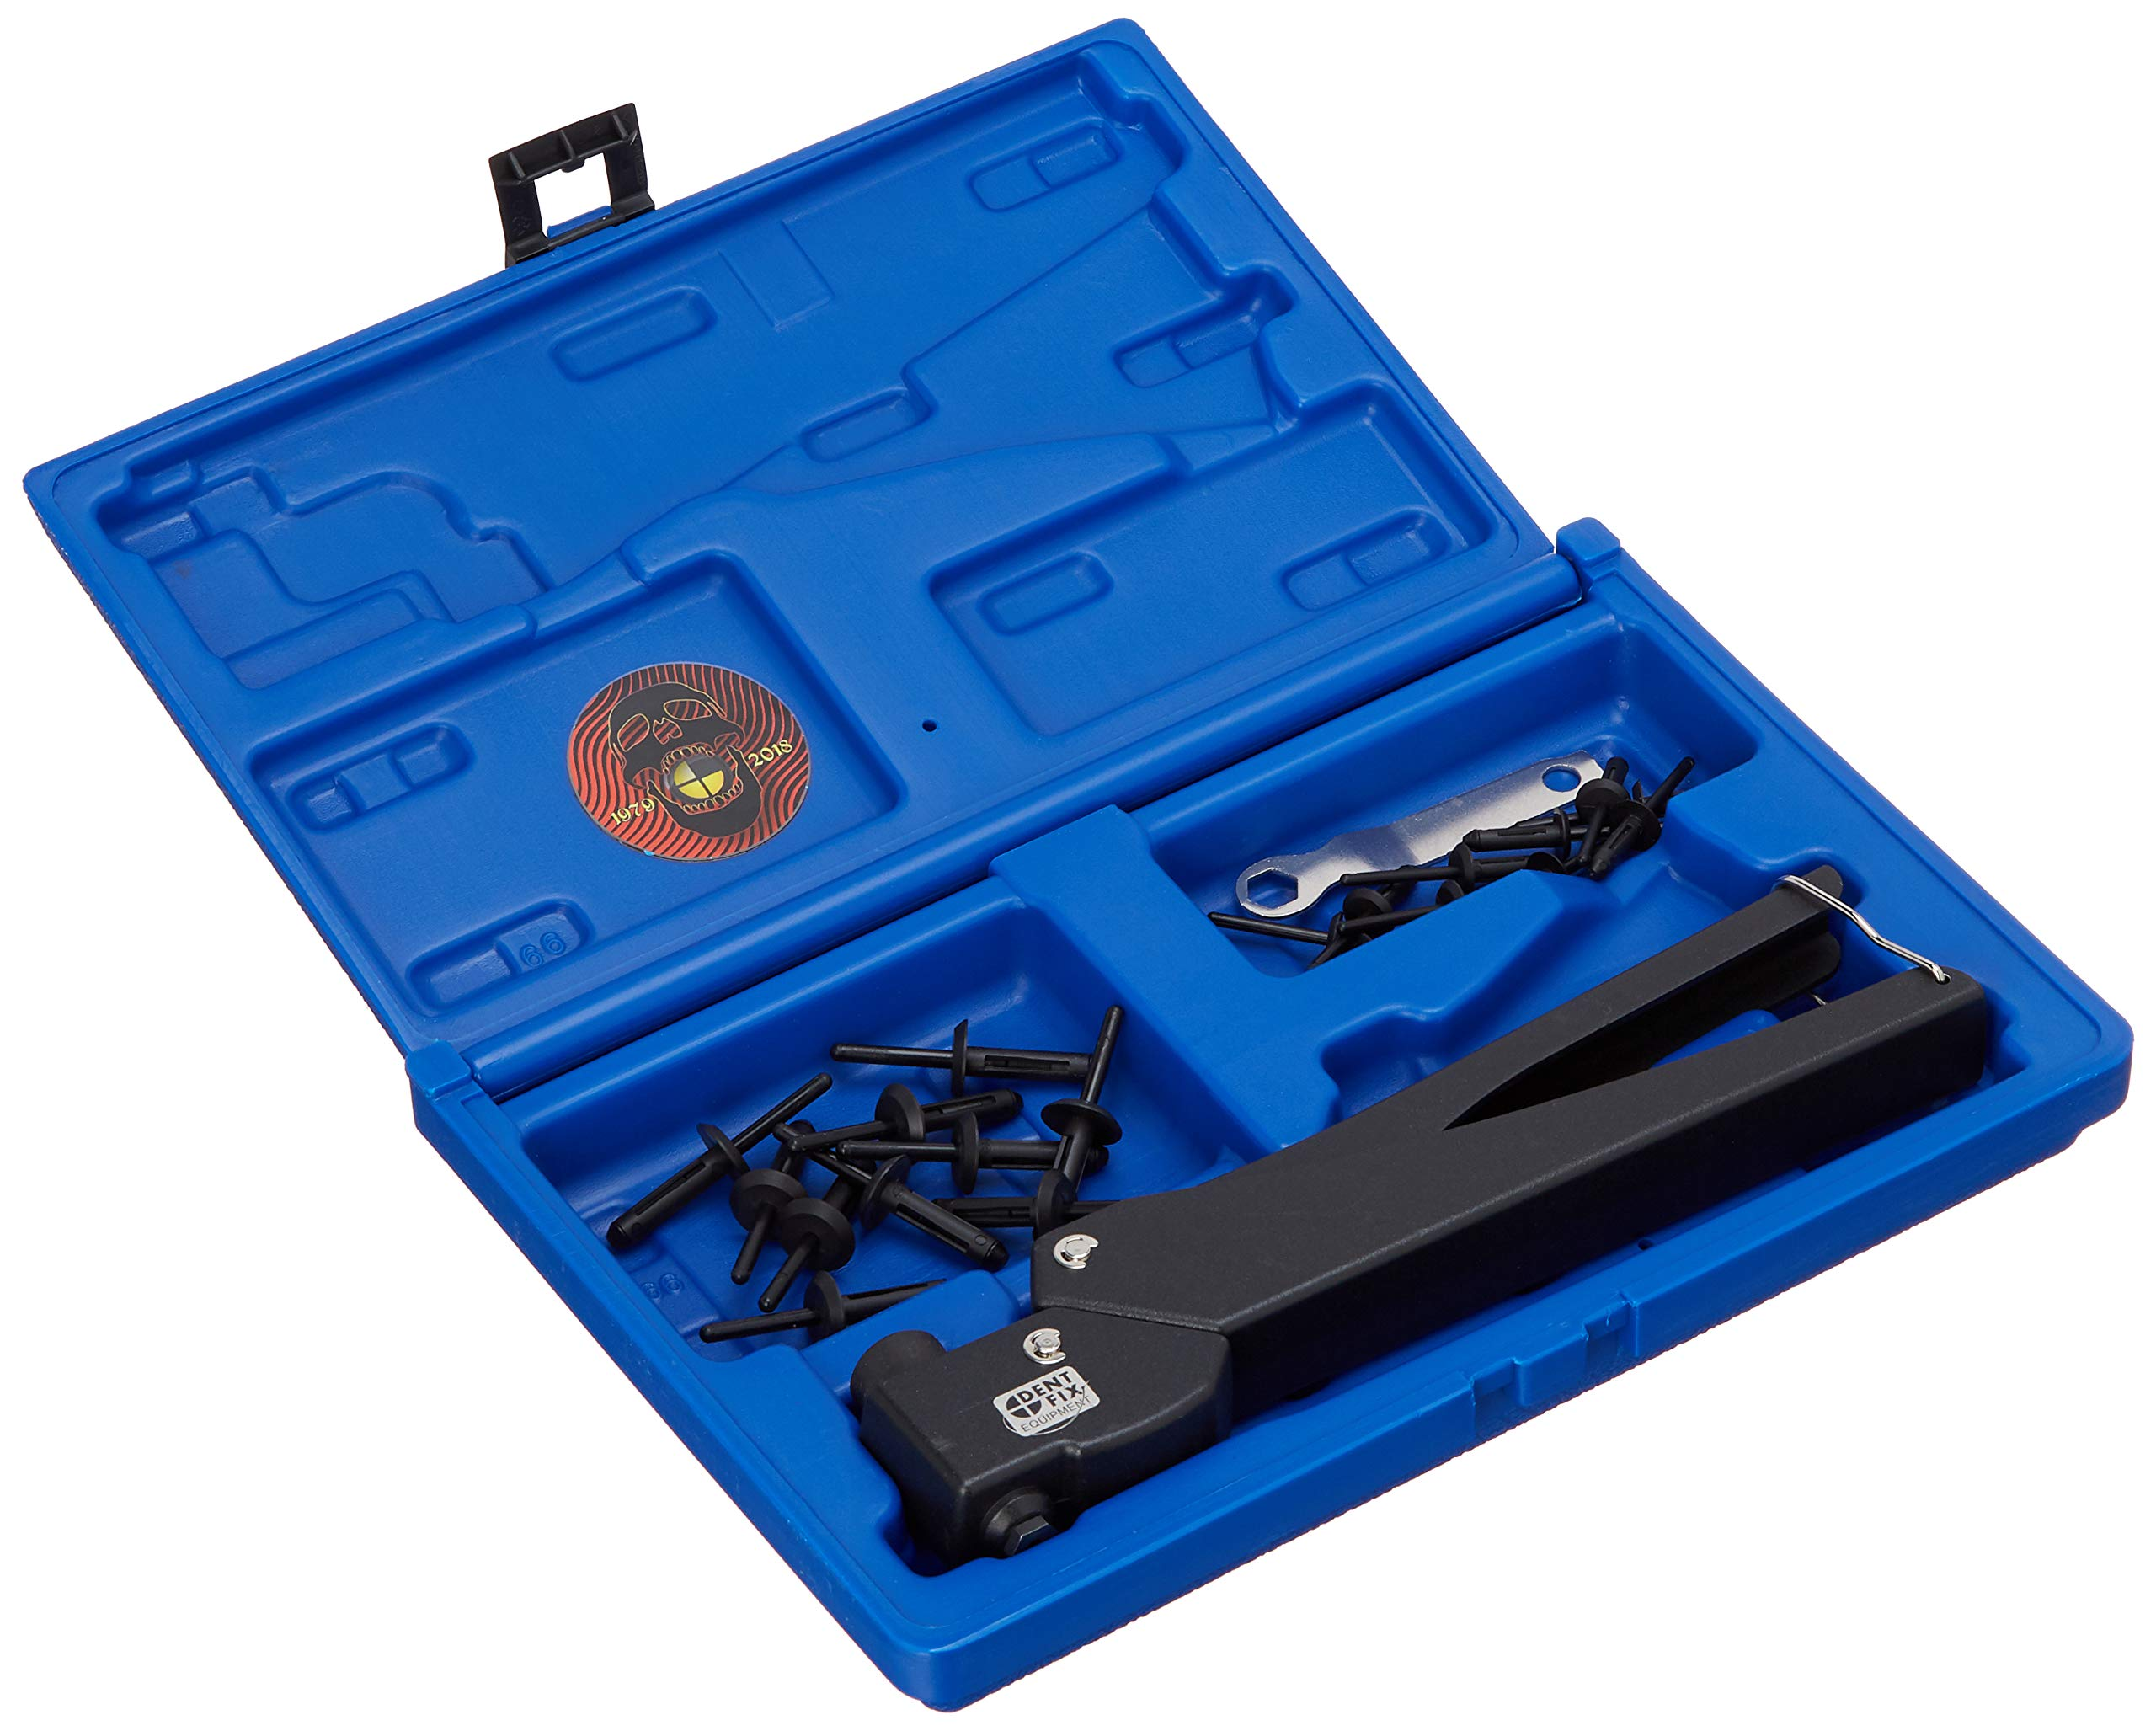 Dent Fix DENDF-CT888 Swivel Slim line Plastic Riveter (Swivel Slimline Plastic Riveter)